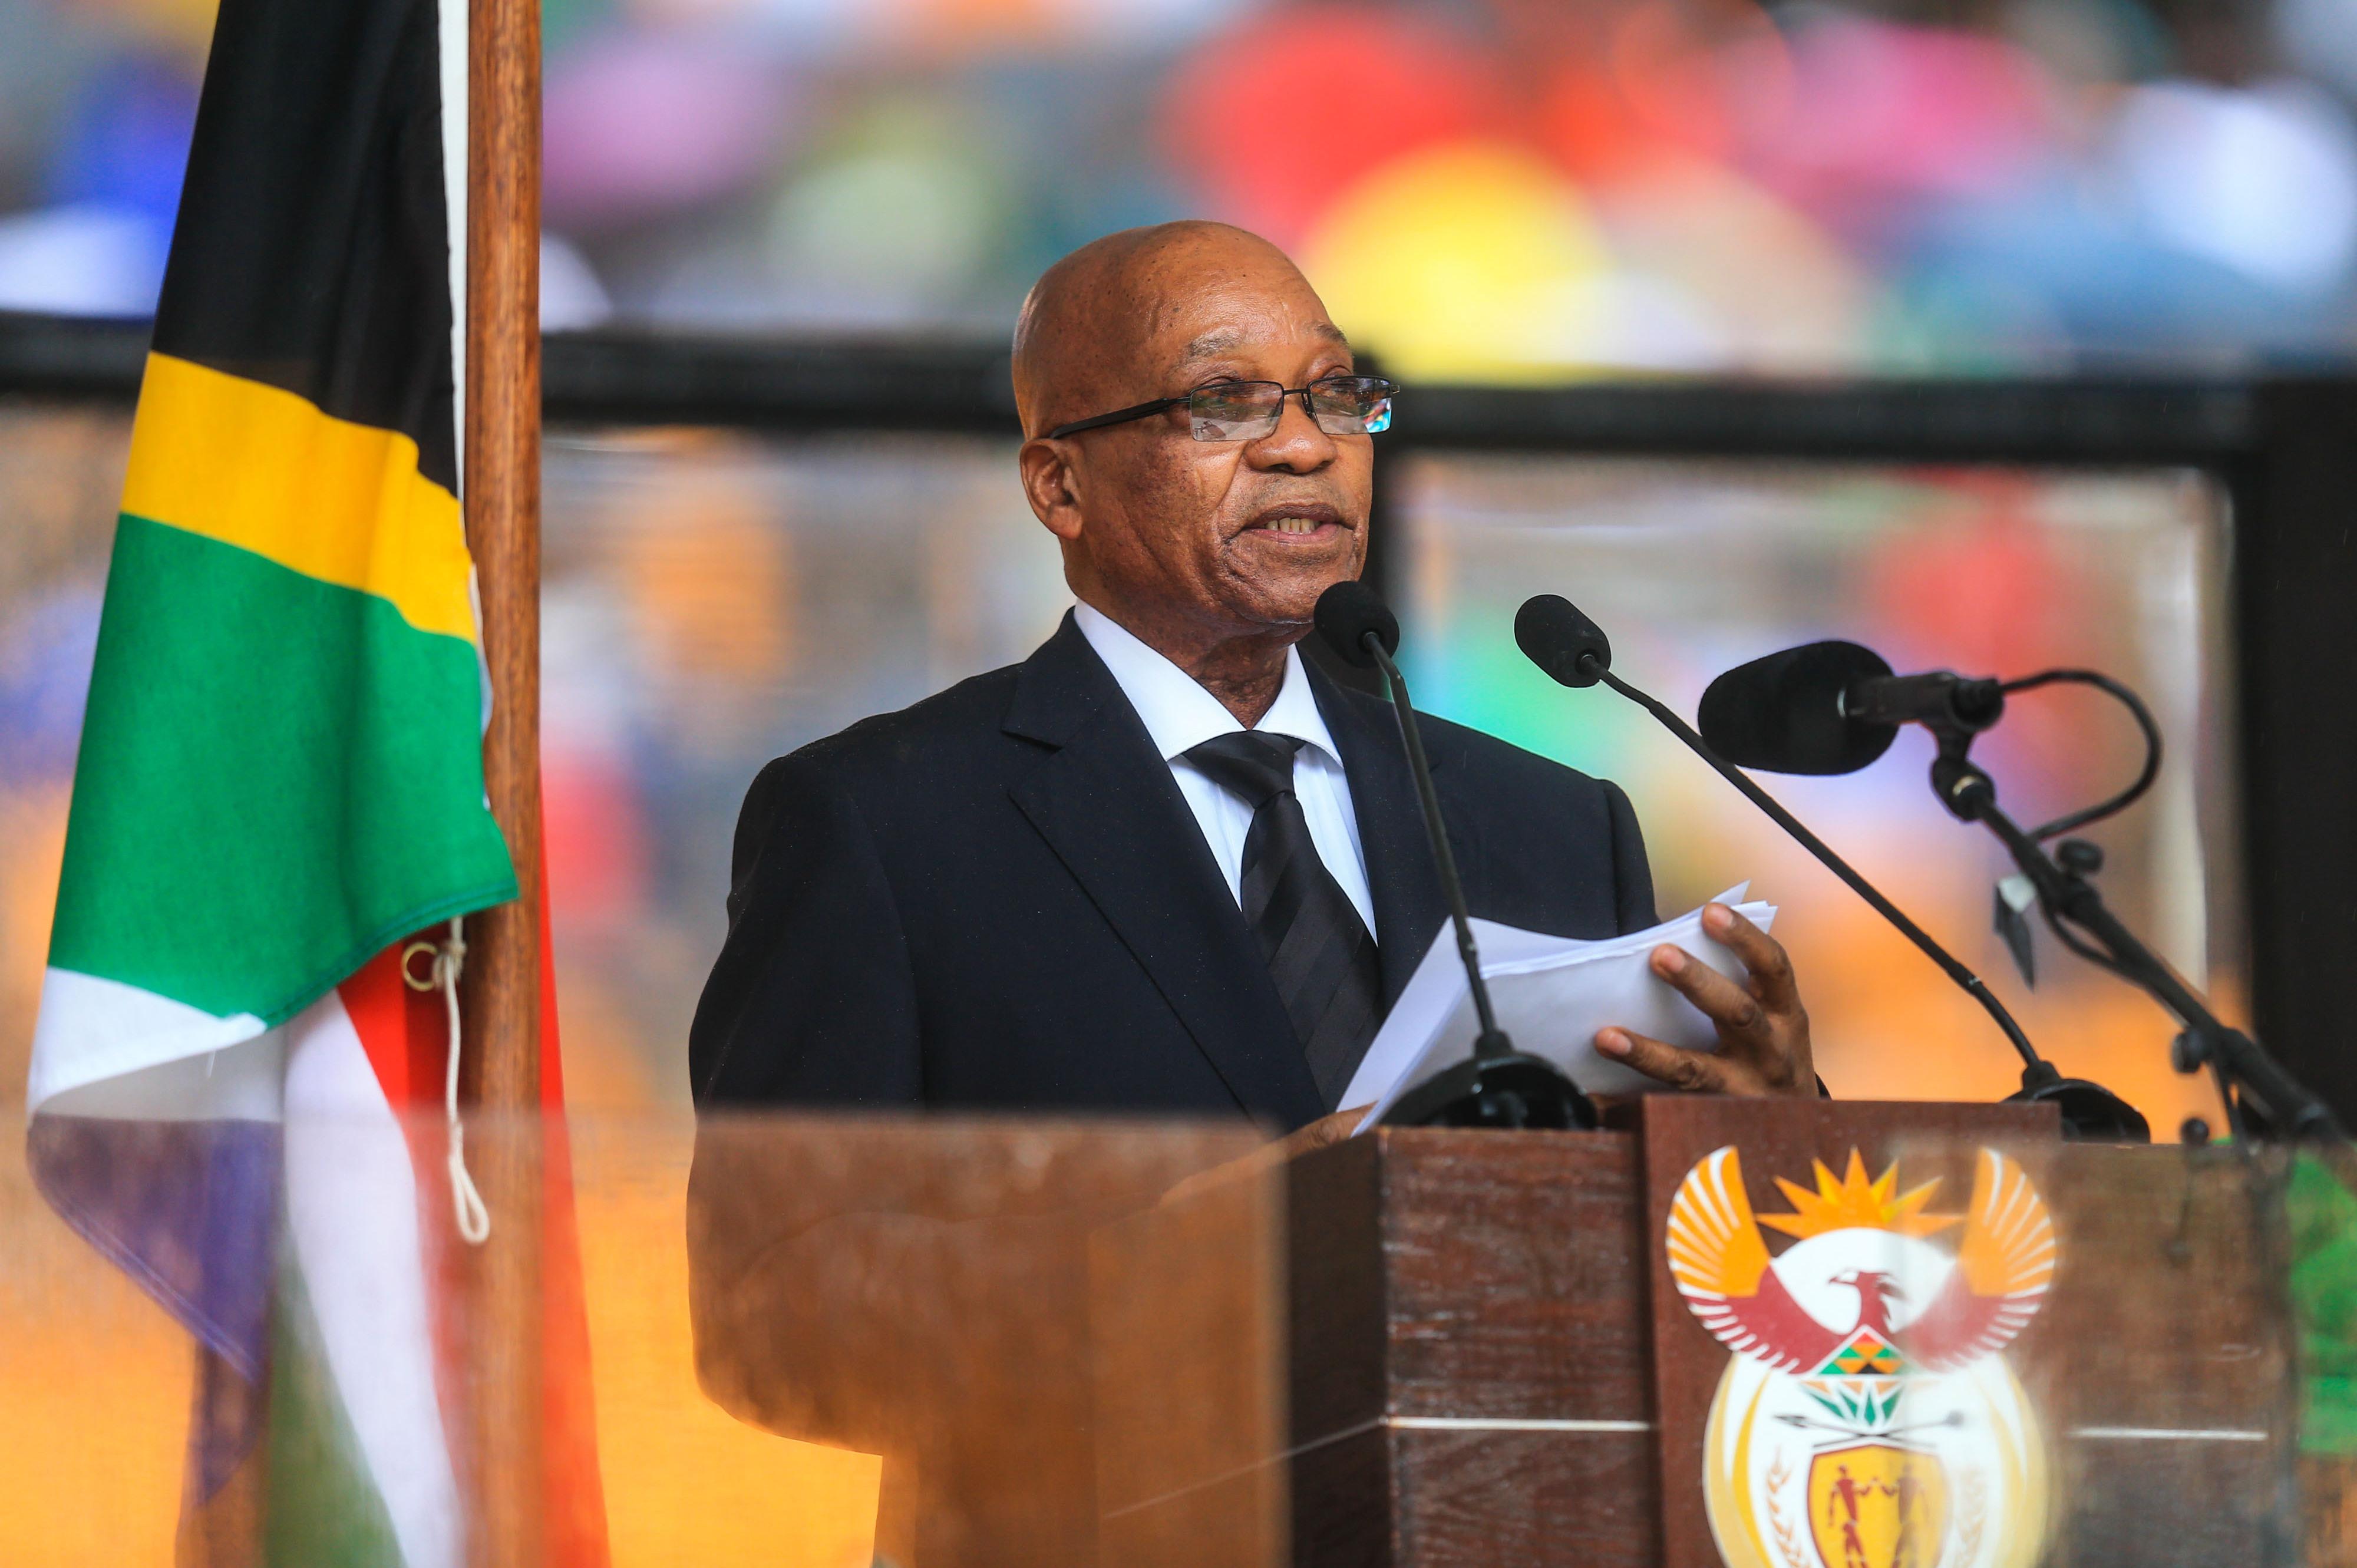 South Africans Cheer Mandela, Jeer President Jacob Zuma